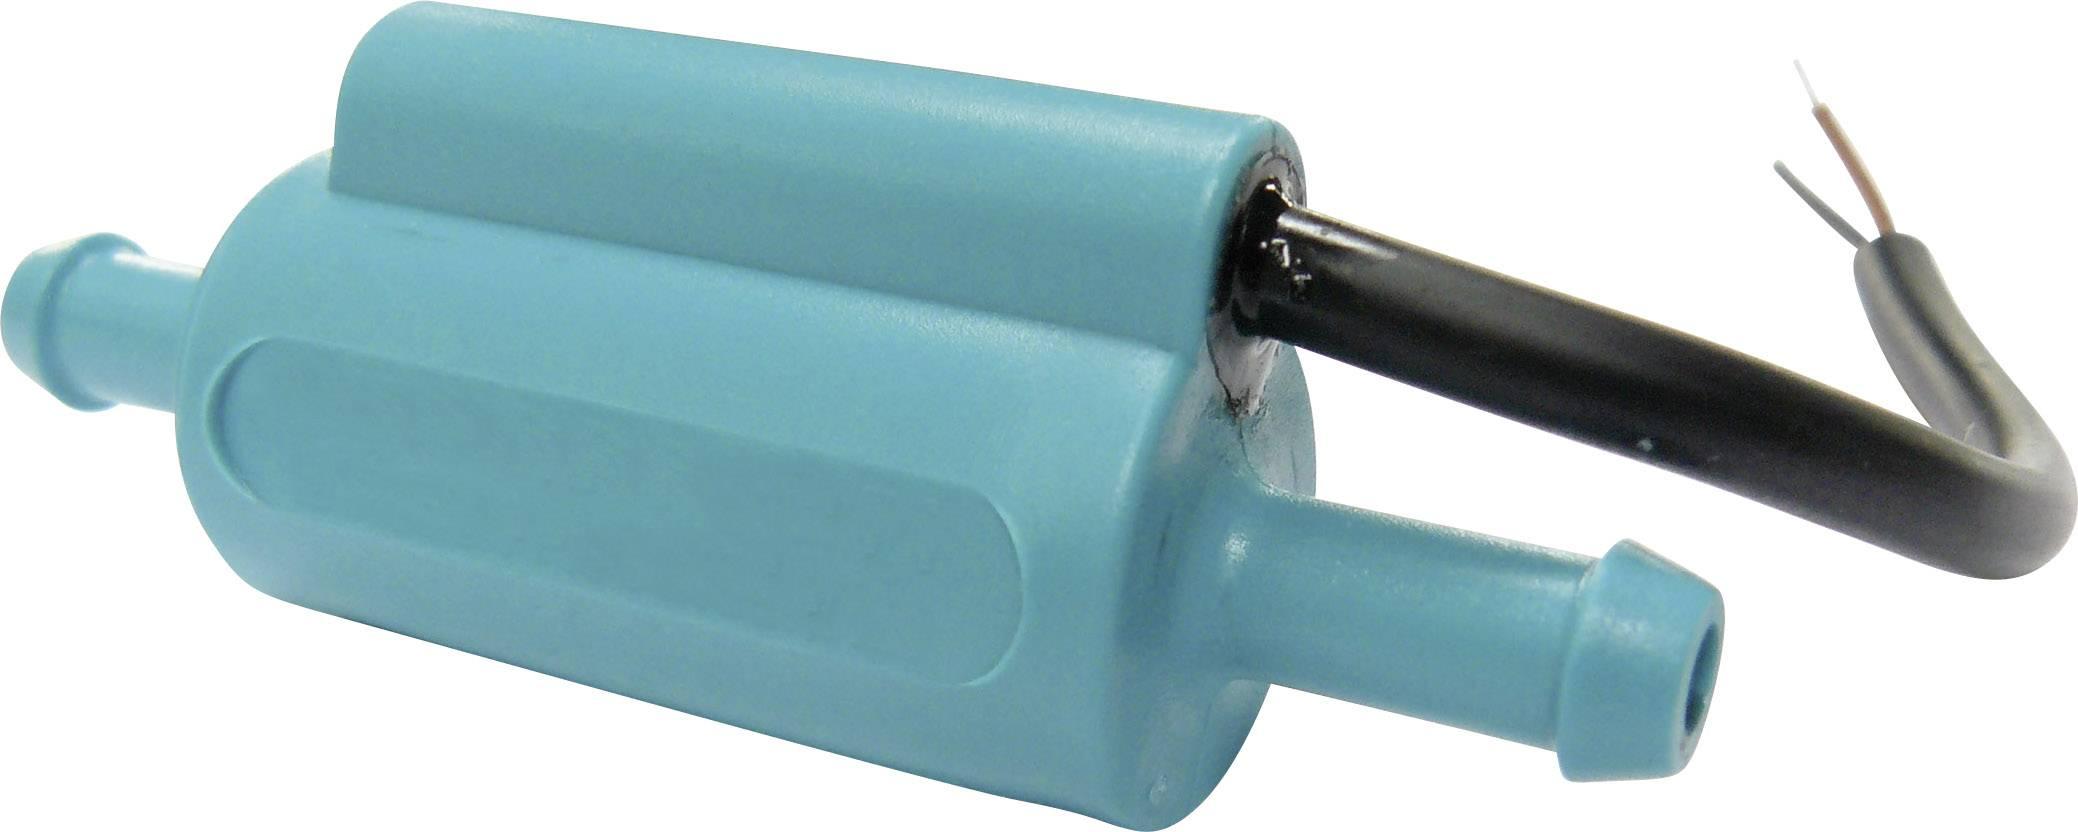 Senzor průtoku Binsack 4001/2-A014, 0.5 - 0.6 l/min, (d x š) 62 mm x 21.5 mm